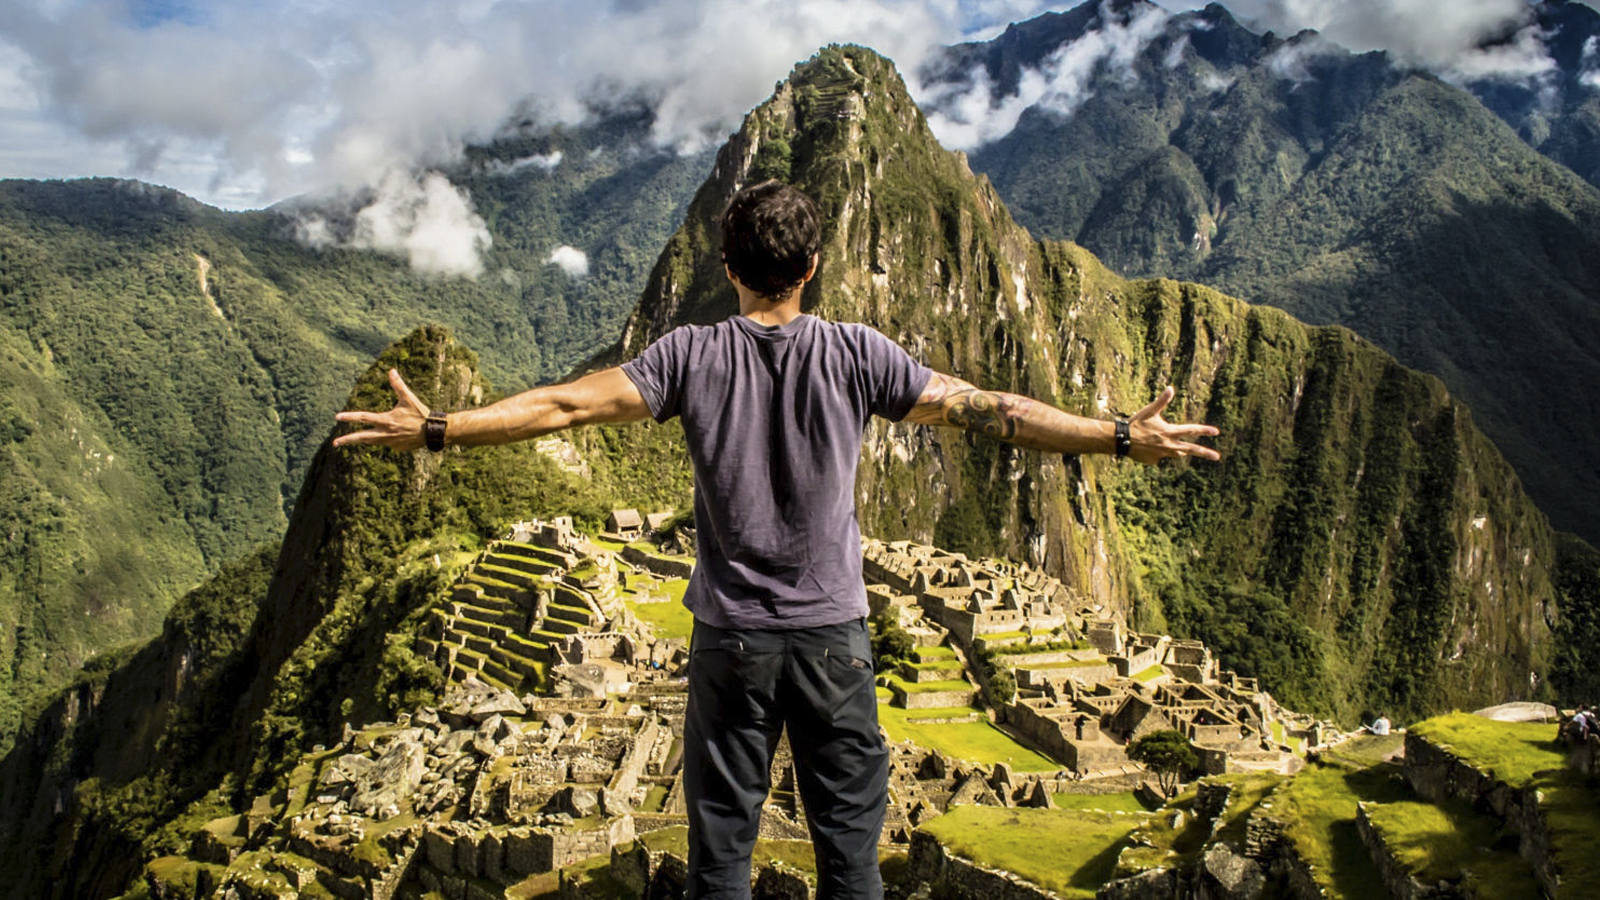 Travel Agency Wallpaper Hd C 243 Mo Ir A Machu Picchu Cu 225 Nto Cuesta No Has Vivido Si